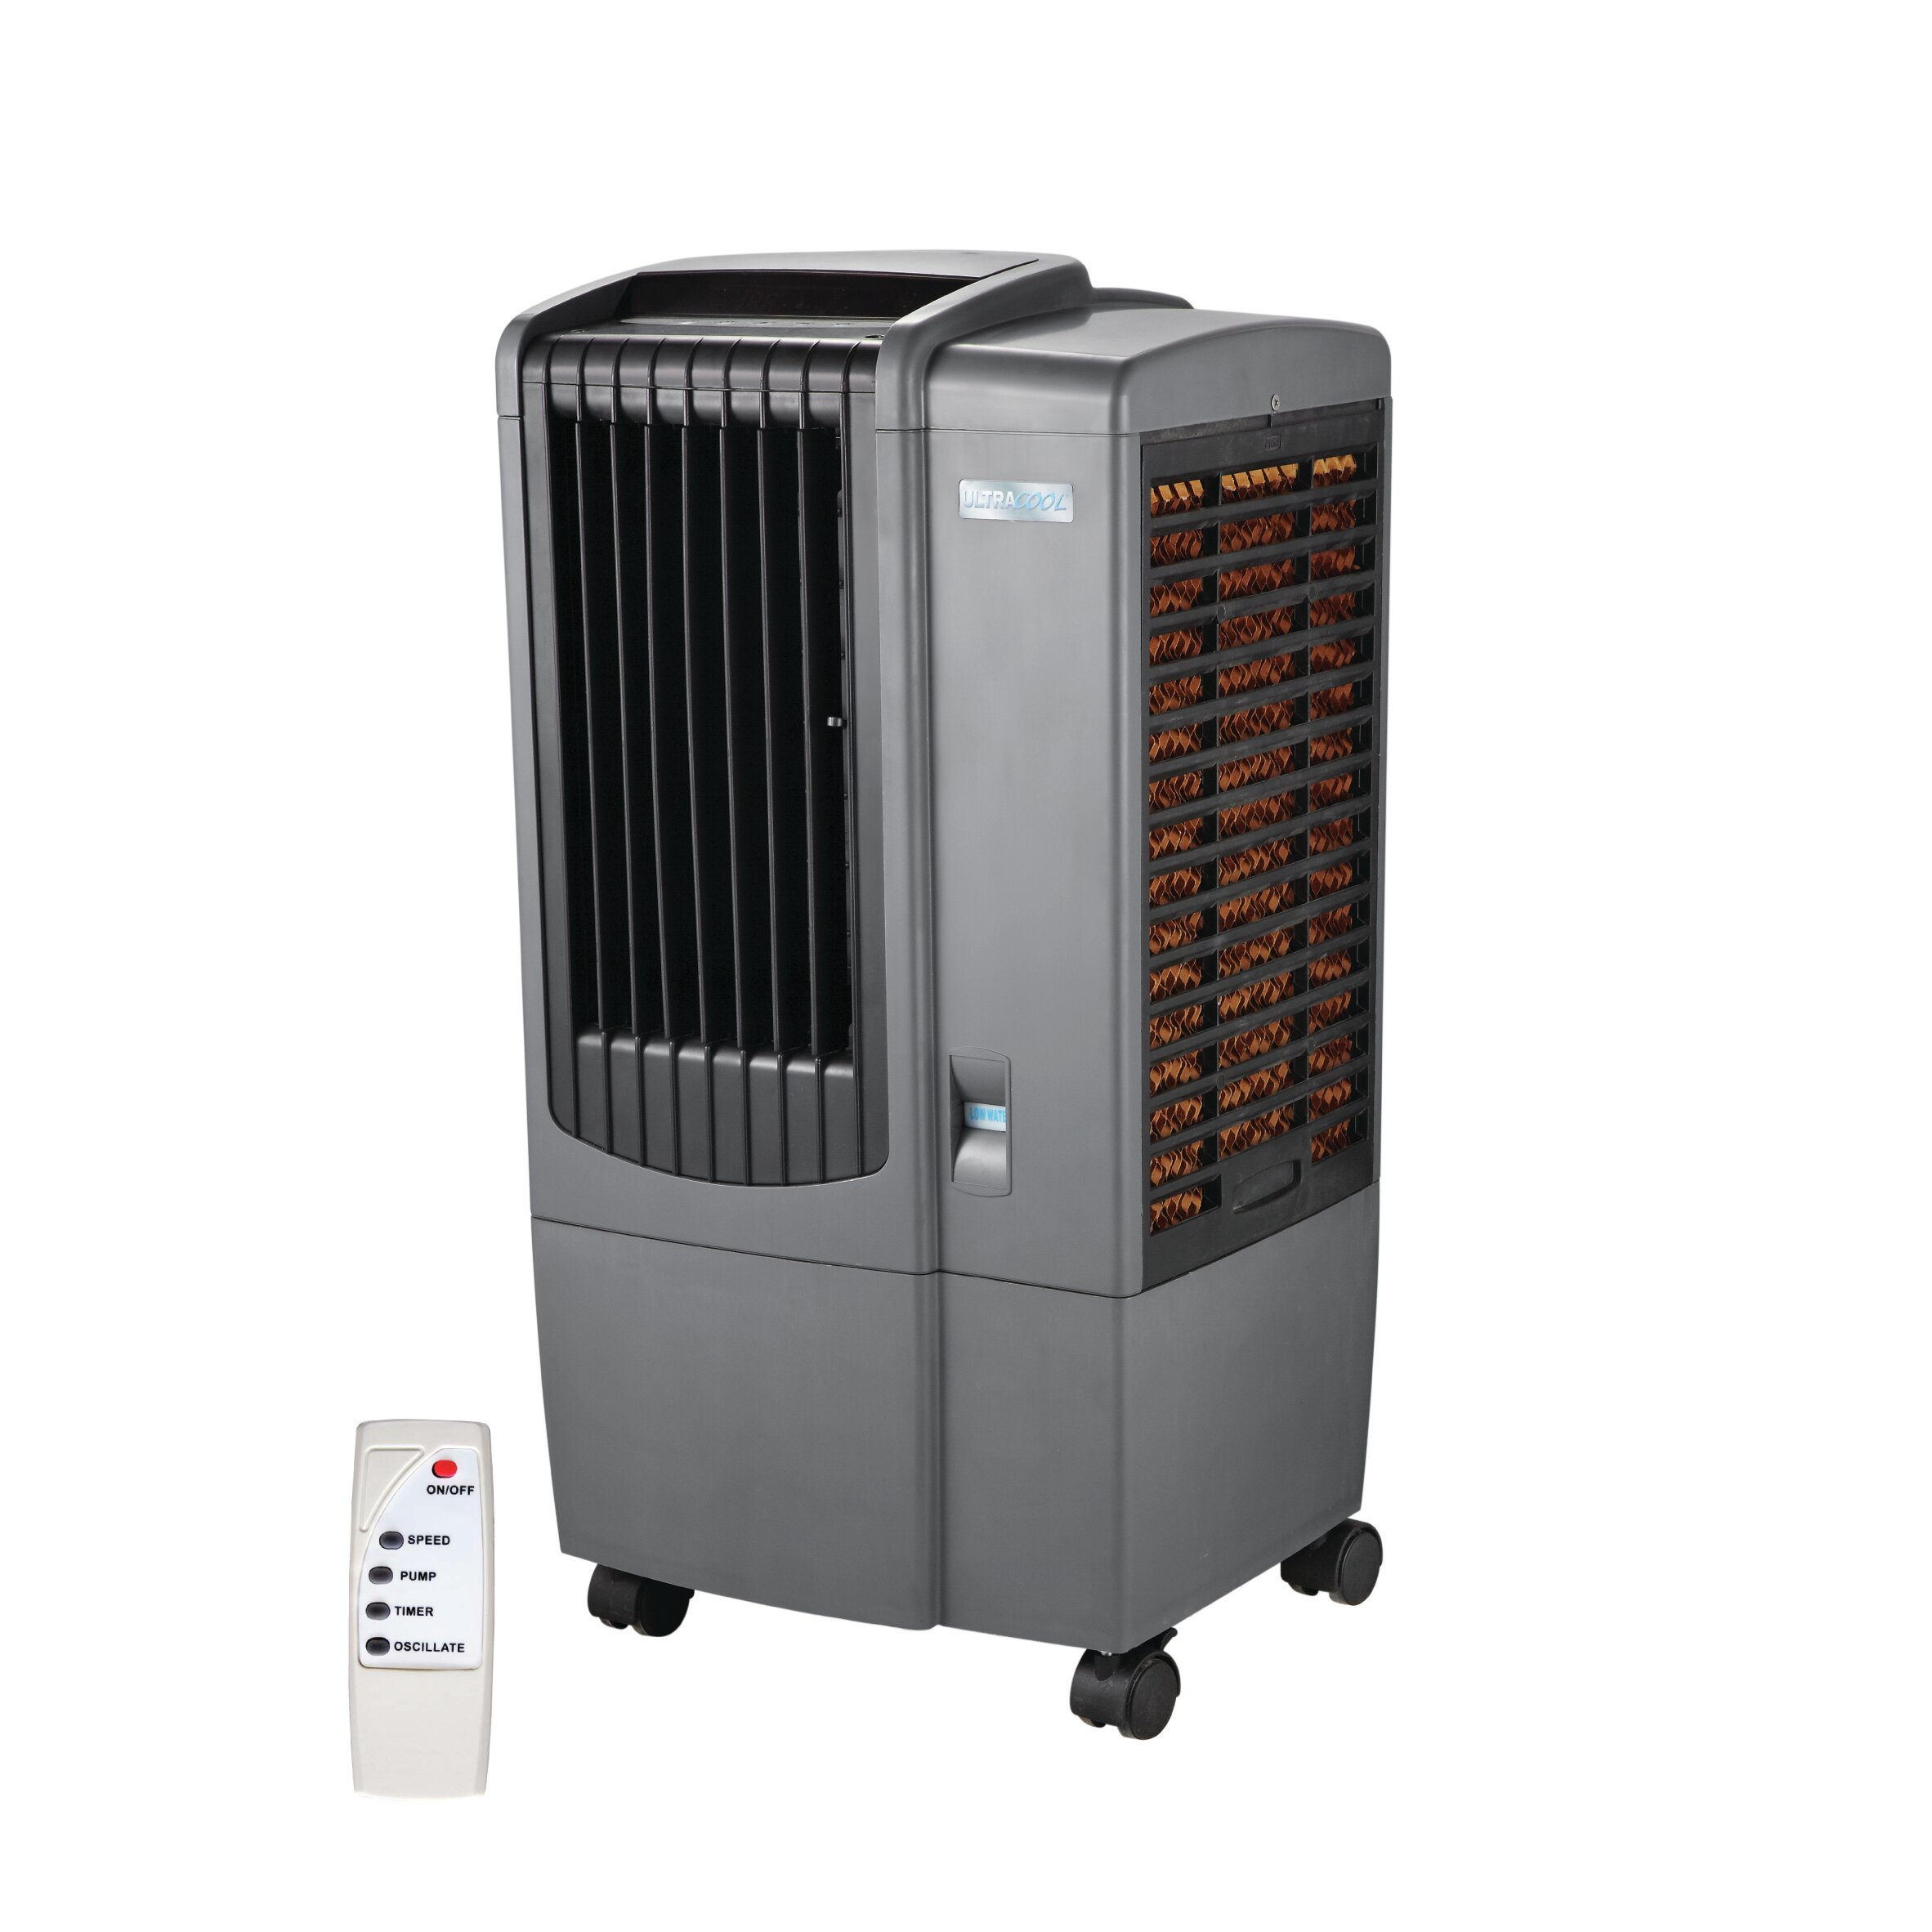 Portable Evaporative Coolers Home Depot : Ultracool portable evaporative cooler with remote